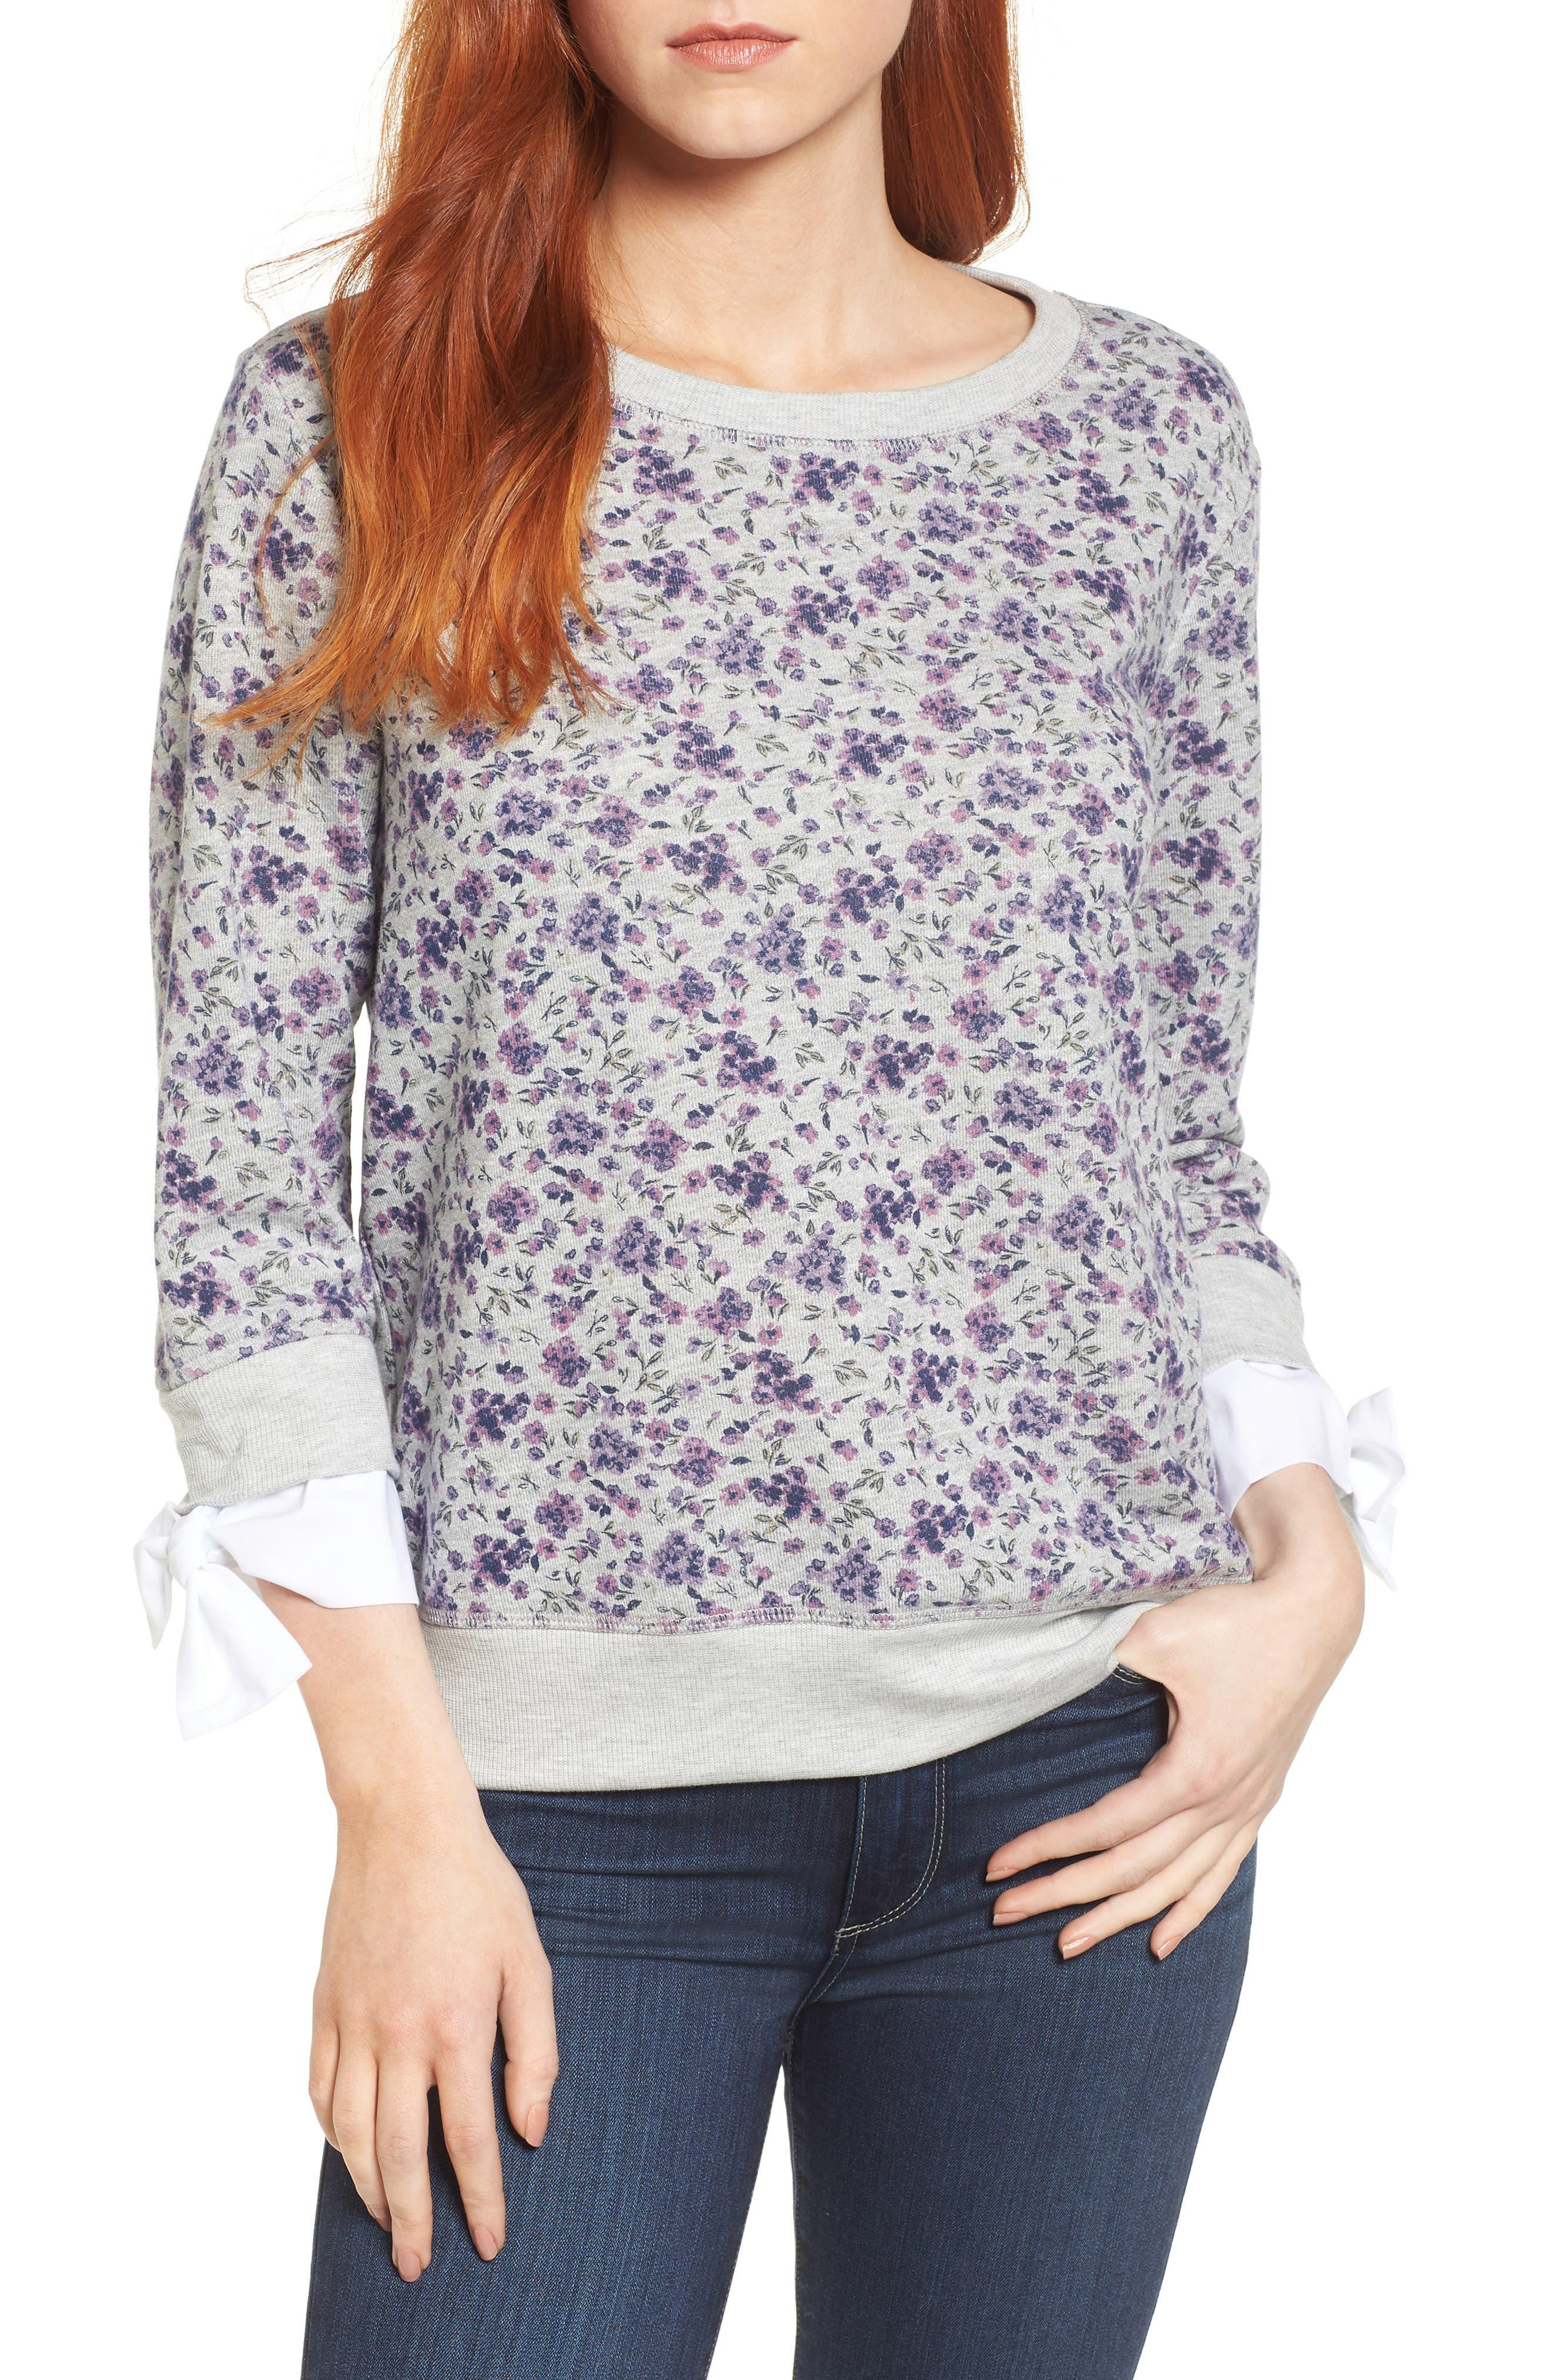 Poplin Cuff Sweatshirt,                             Main thumbnail 1, color,                             GREY FLORAL W/ WHITE POPLIN